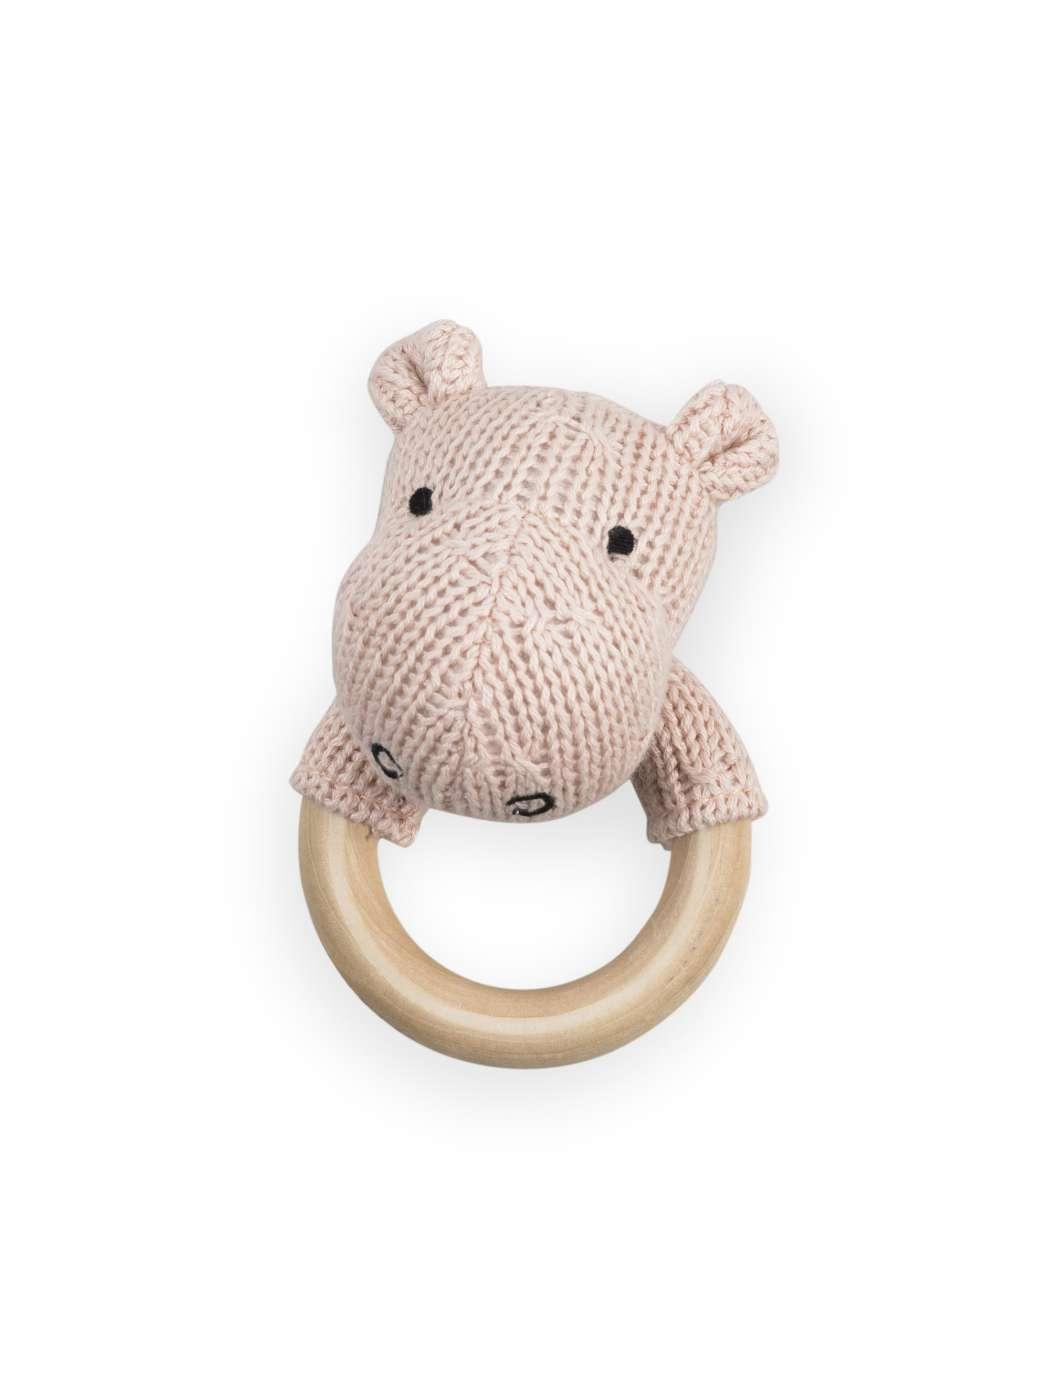 Rammelaar_bijtring_O_7cm_Soft_knit_hippo_creamy_peach